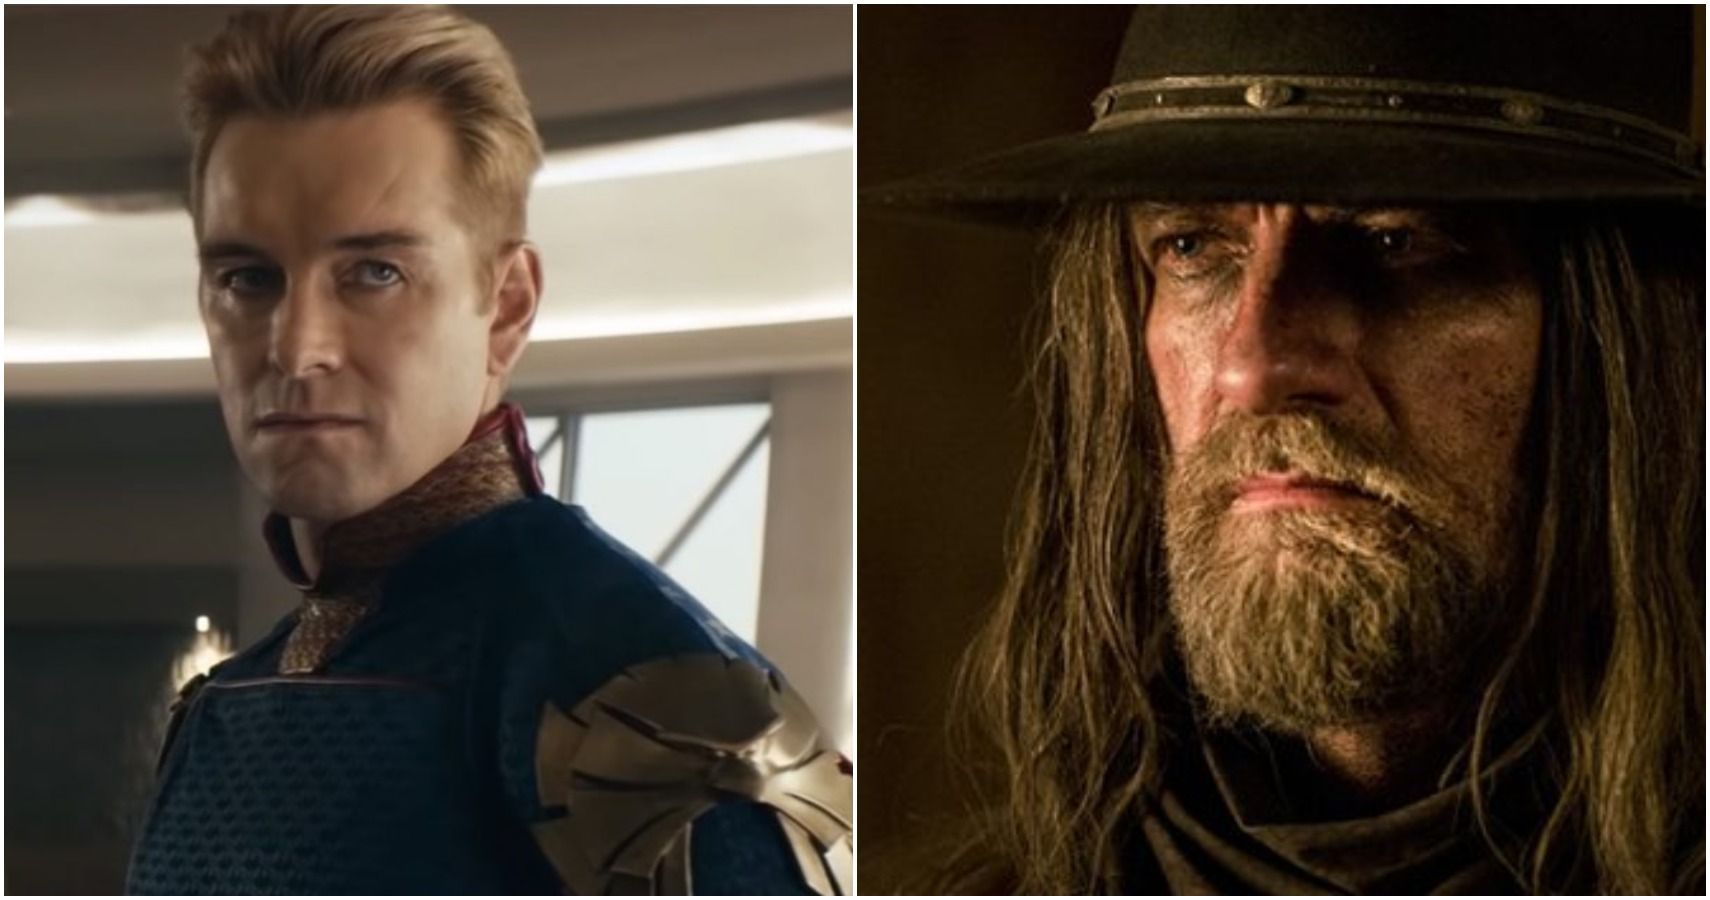 The Boys' Homelander Vs. Preacher's Saint Of Killers: Who Would Win?